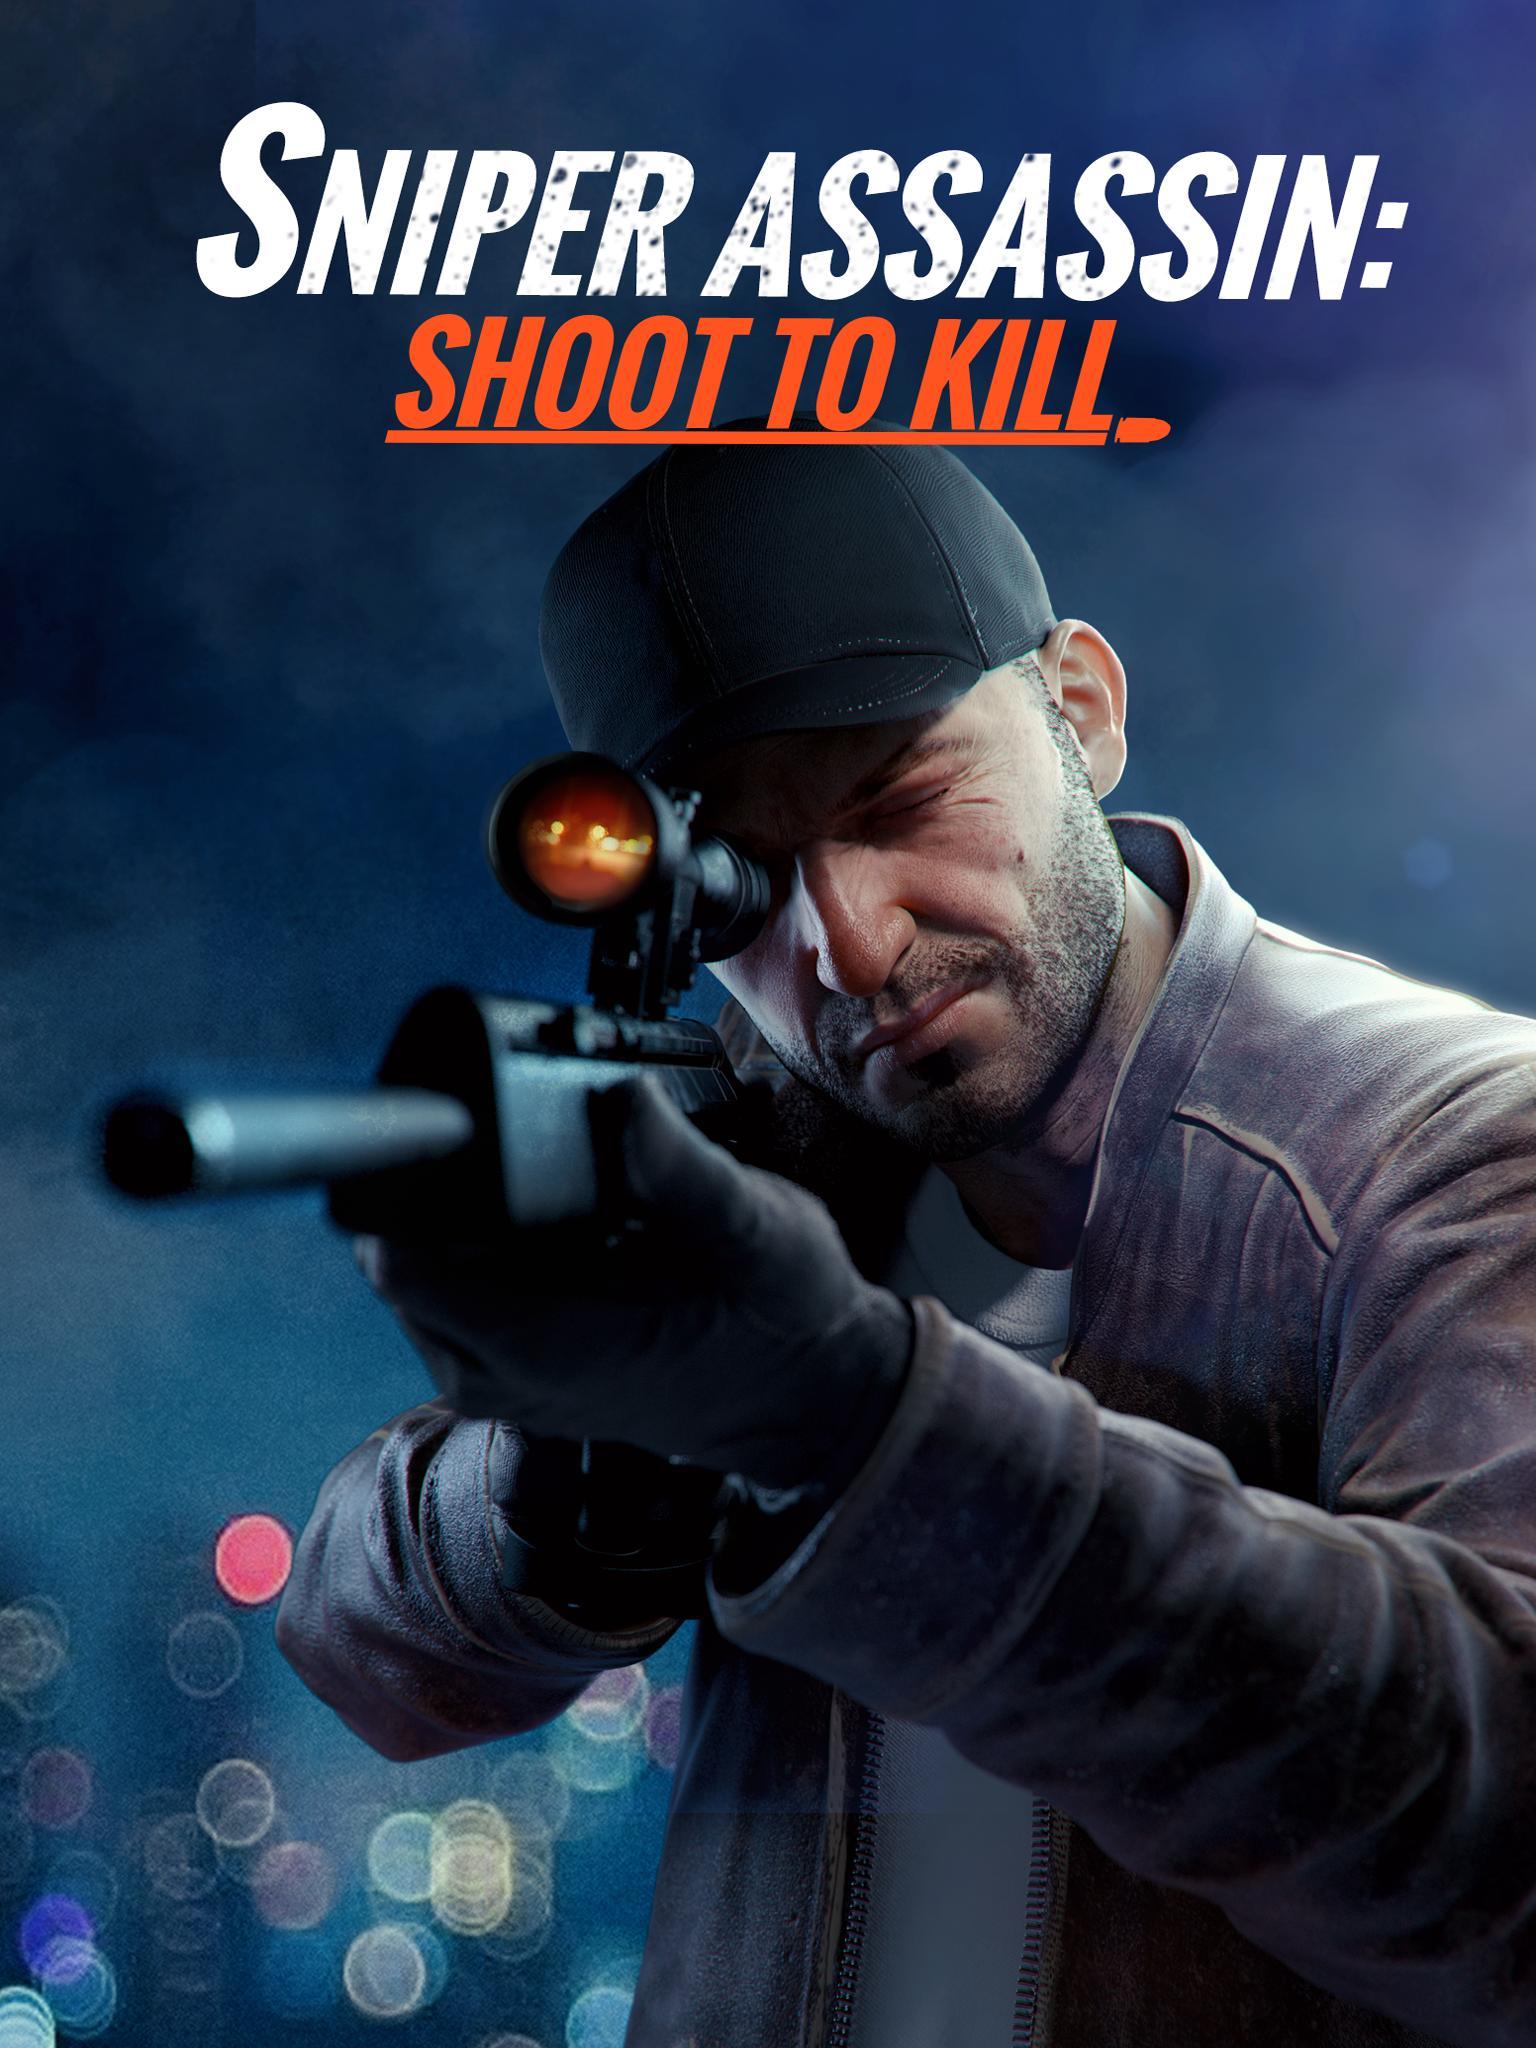 Sniper 3D Fun Free Online FPS Shooting Game 3.15.1 Screenshot 23